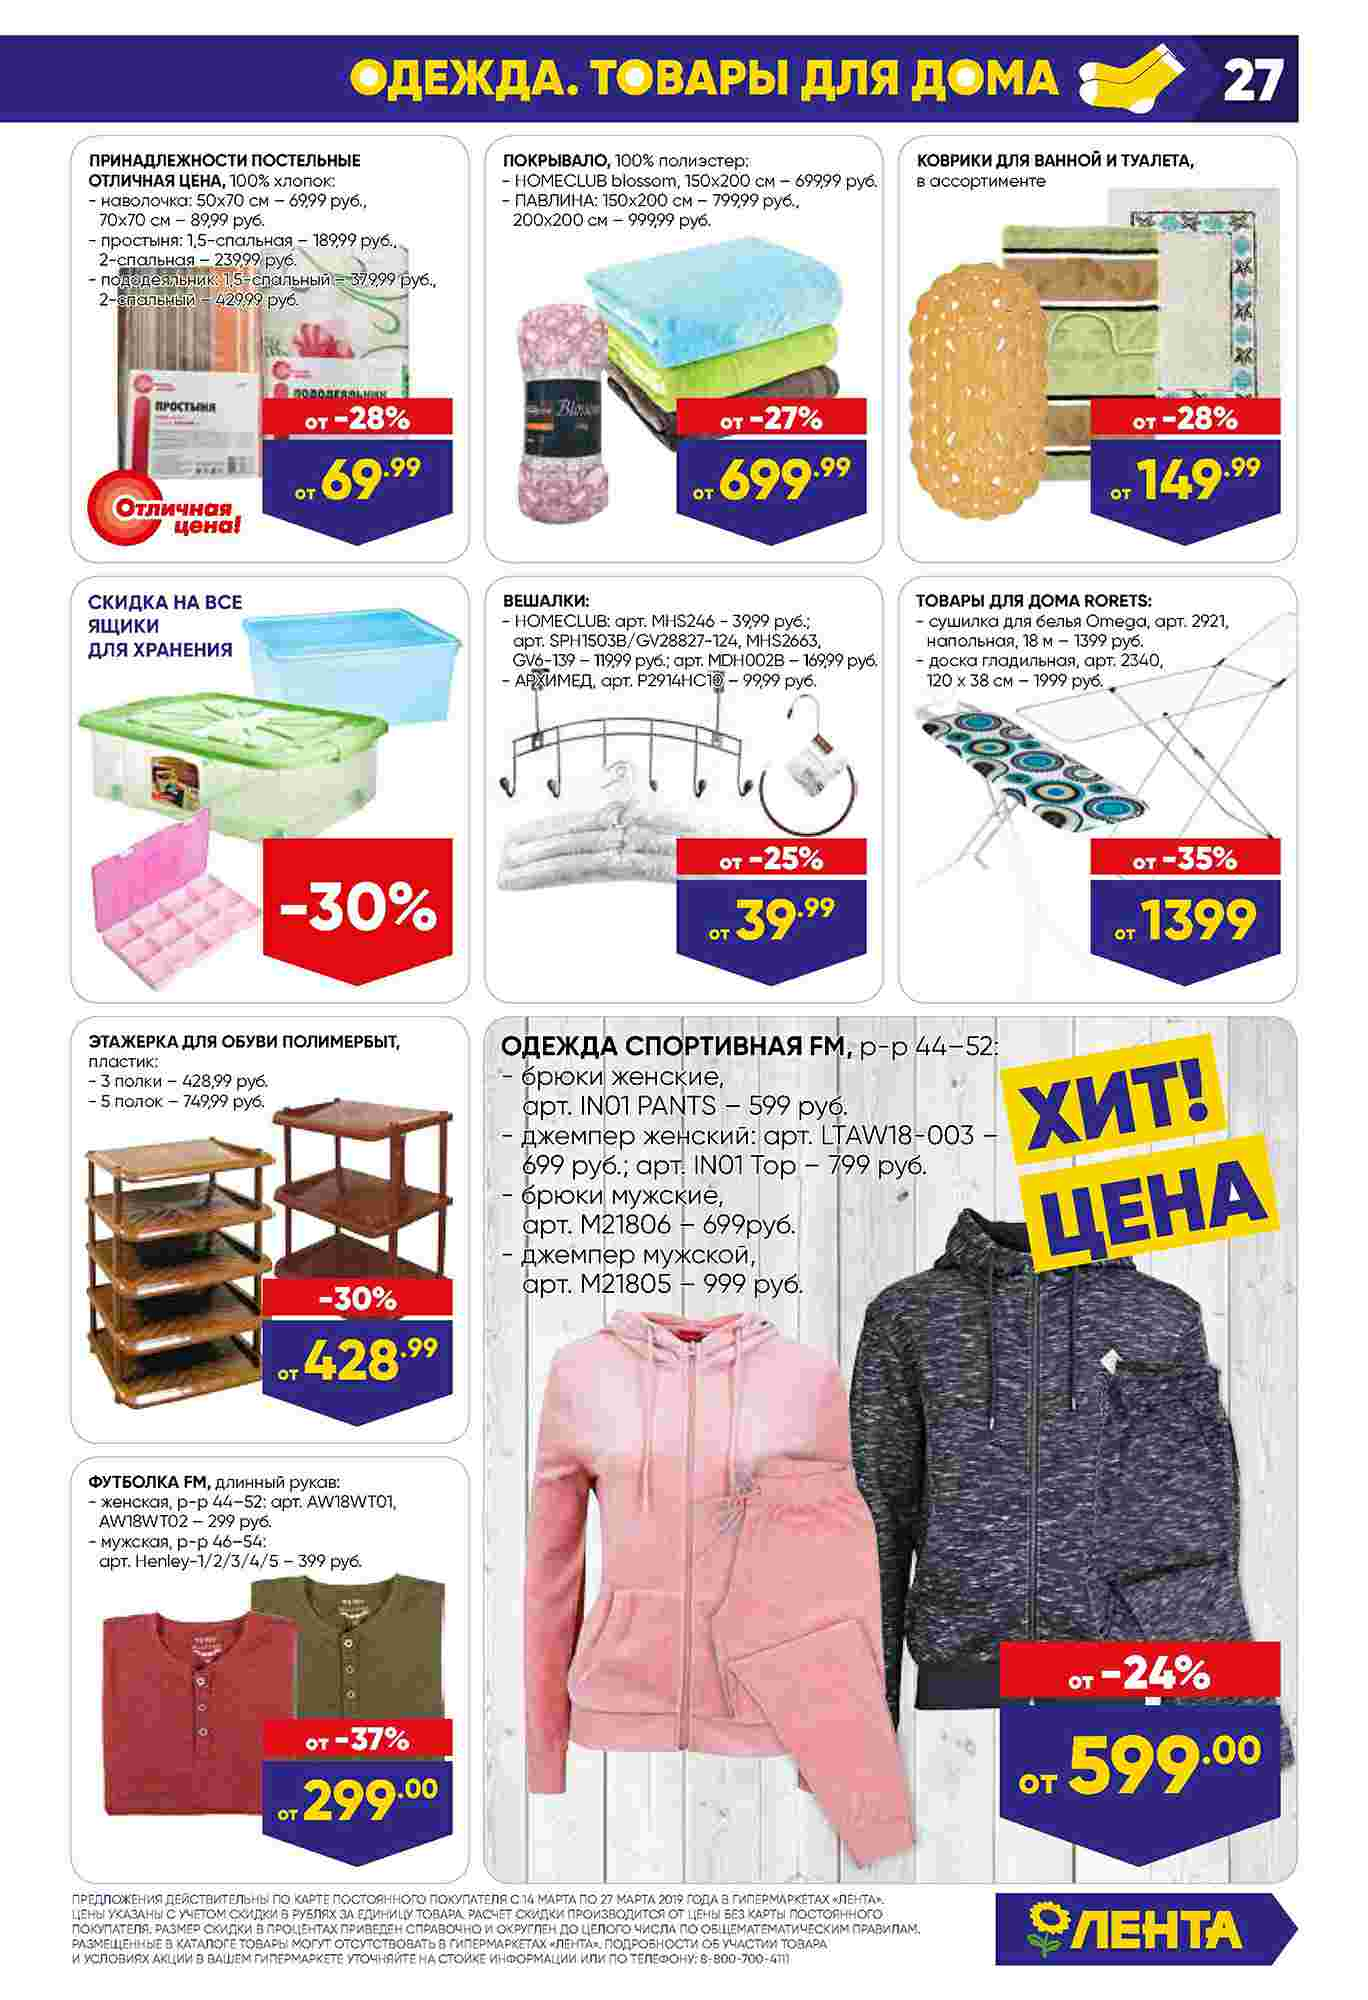 Каталог Лента гипермаркет 14-27.03.2019 стр. - 0001 - 0027